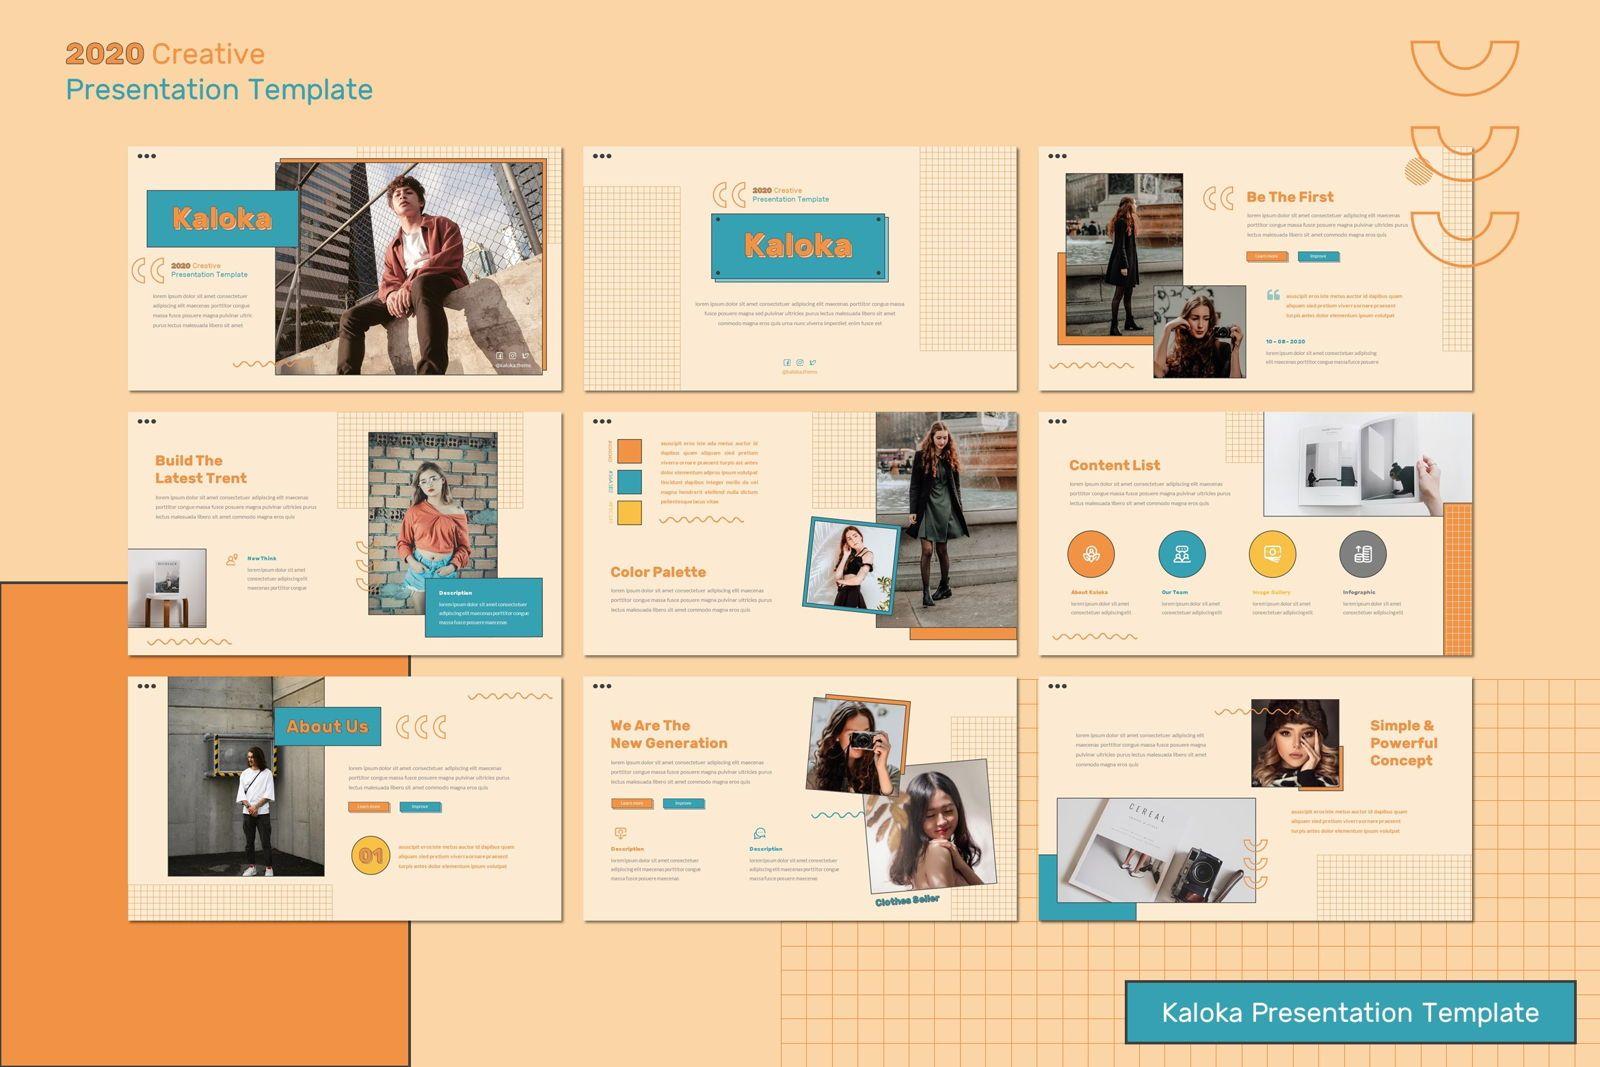 Kaloka - Powerpoint Template, Slide 2, 07778, Presentation Templates — PoweredTemplate.com